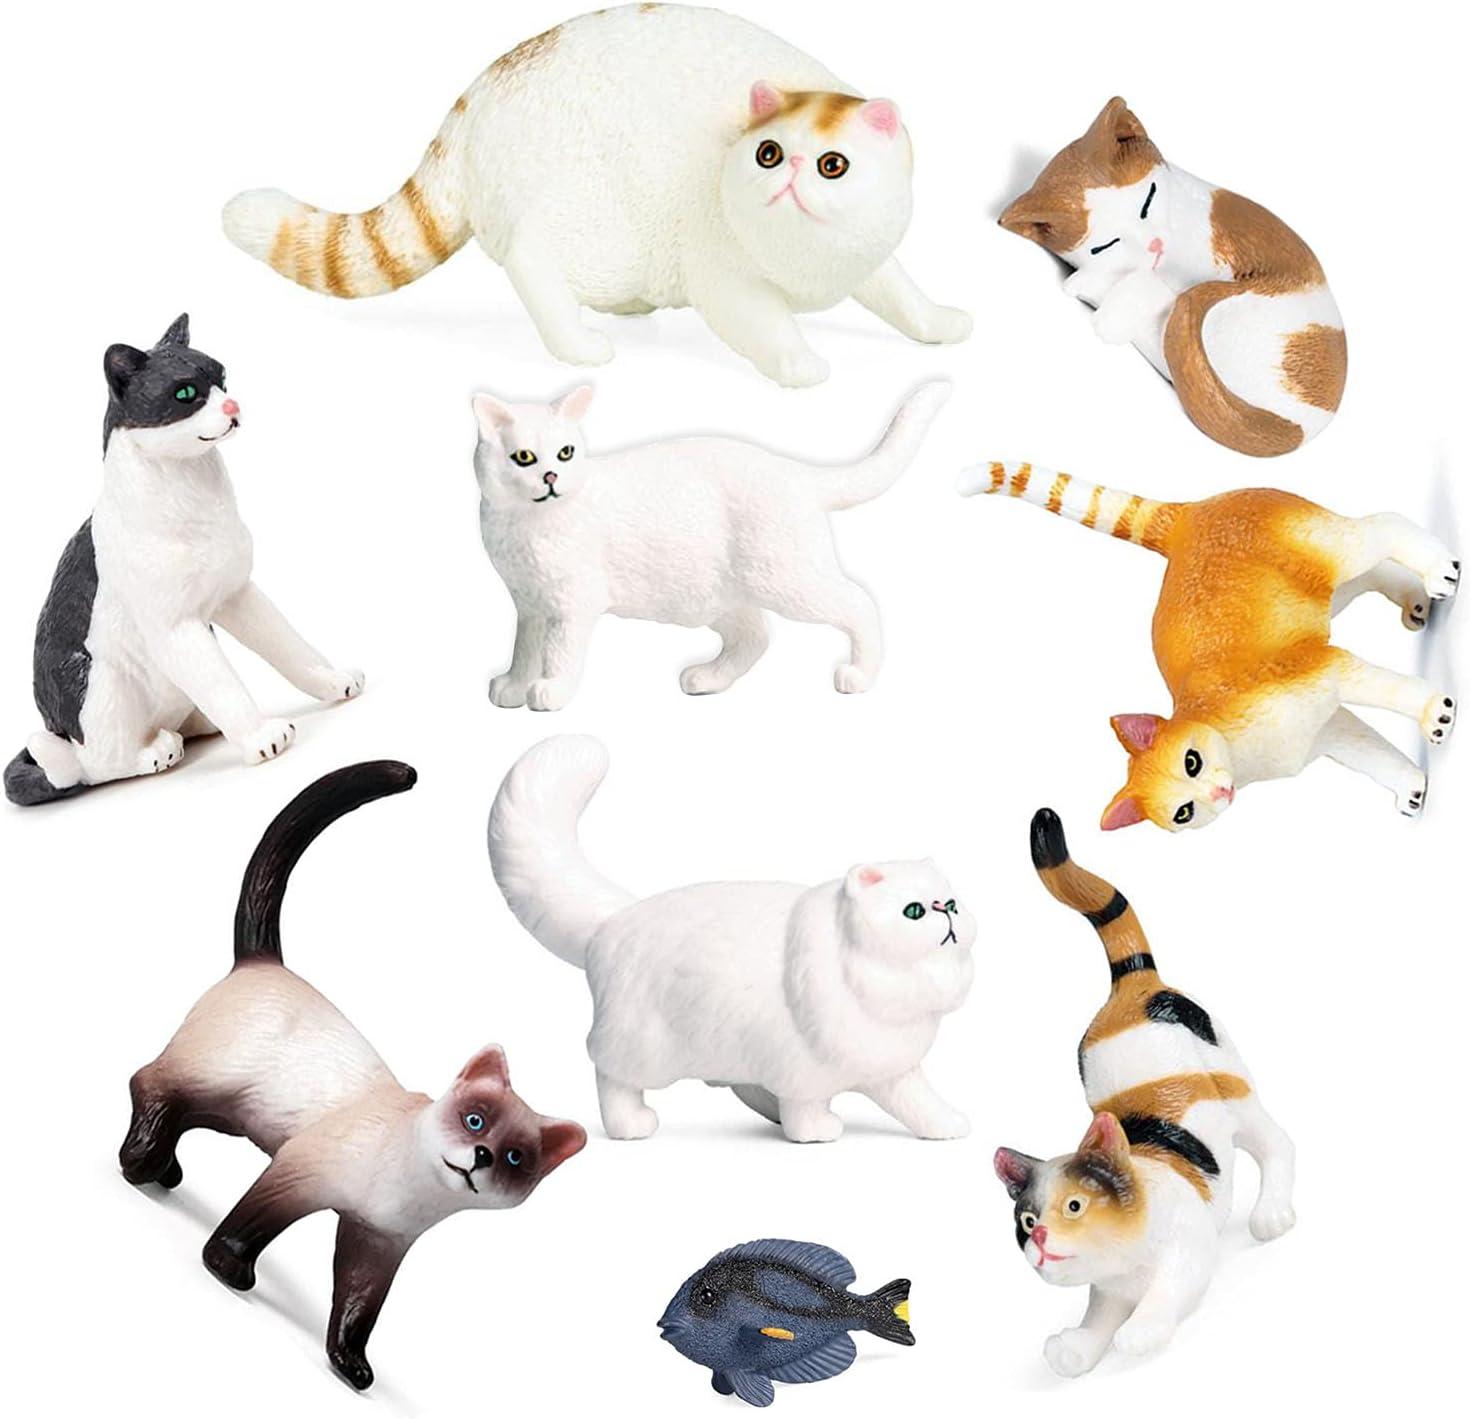 Cat Animal Over item handling Figures Spring new work OrgMemory 9pcs Toys Fi Animals